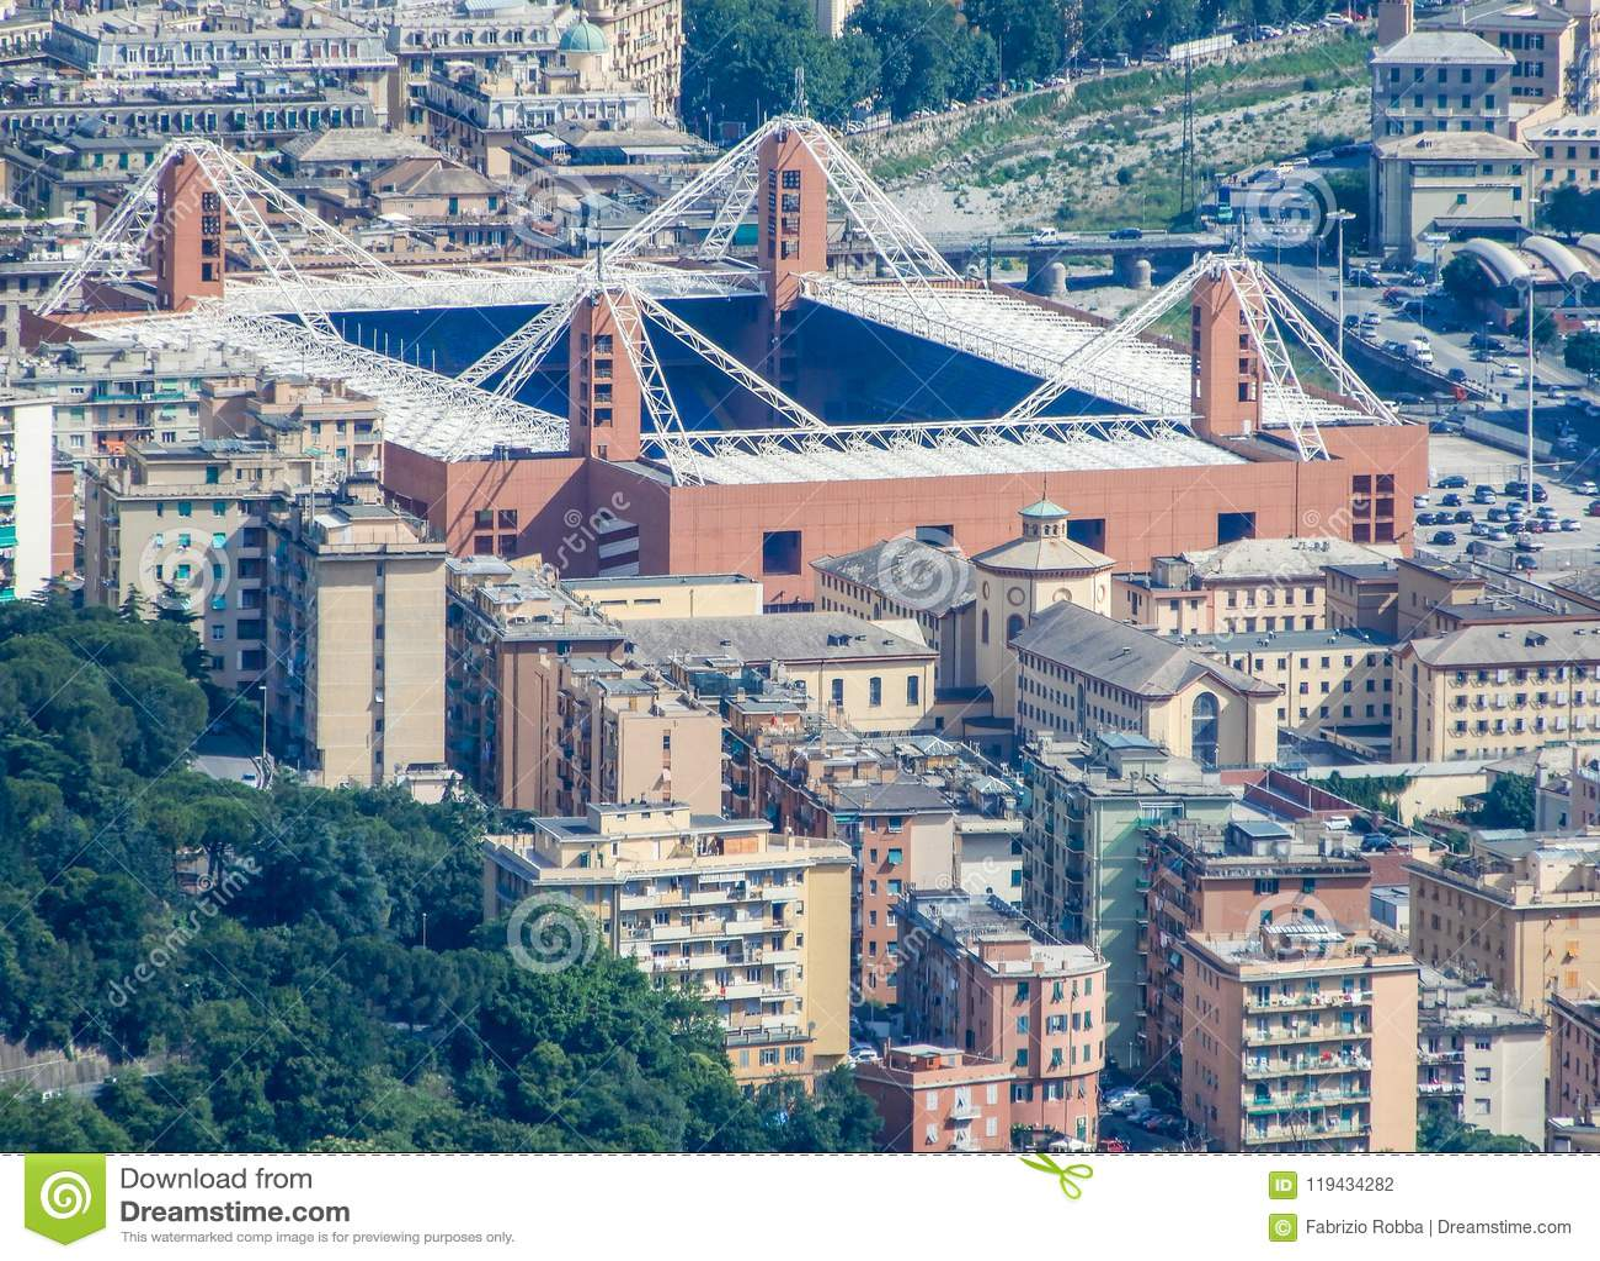 Aerial view of the football stadium` Luigi Ferraris` of Genoa, Genova, Italy. In this Stadium play Serie A teams of Genoa Cricke